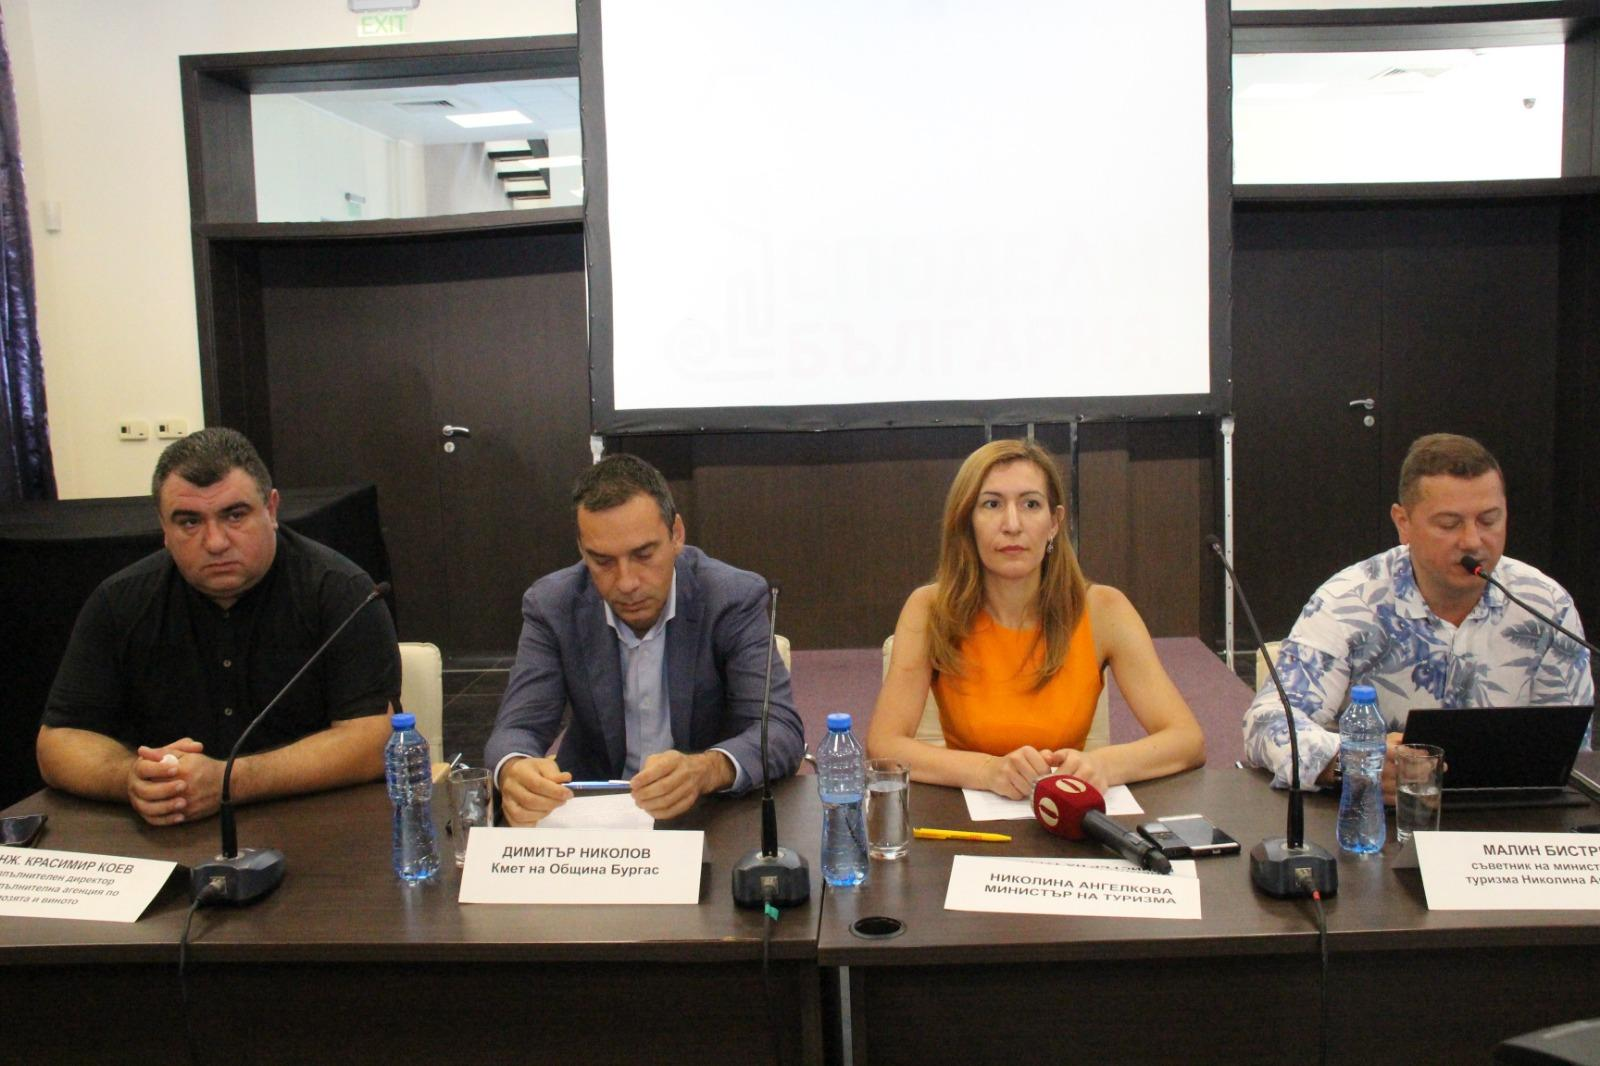 Дискутираха в Бургас винено-кулинарни туристически дестинации в България